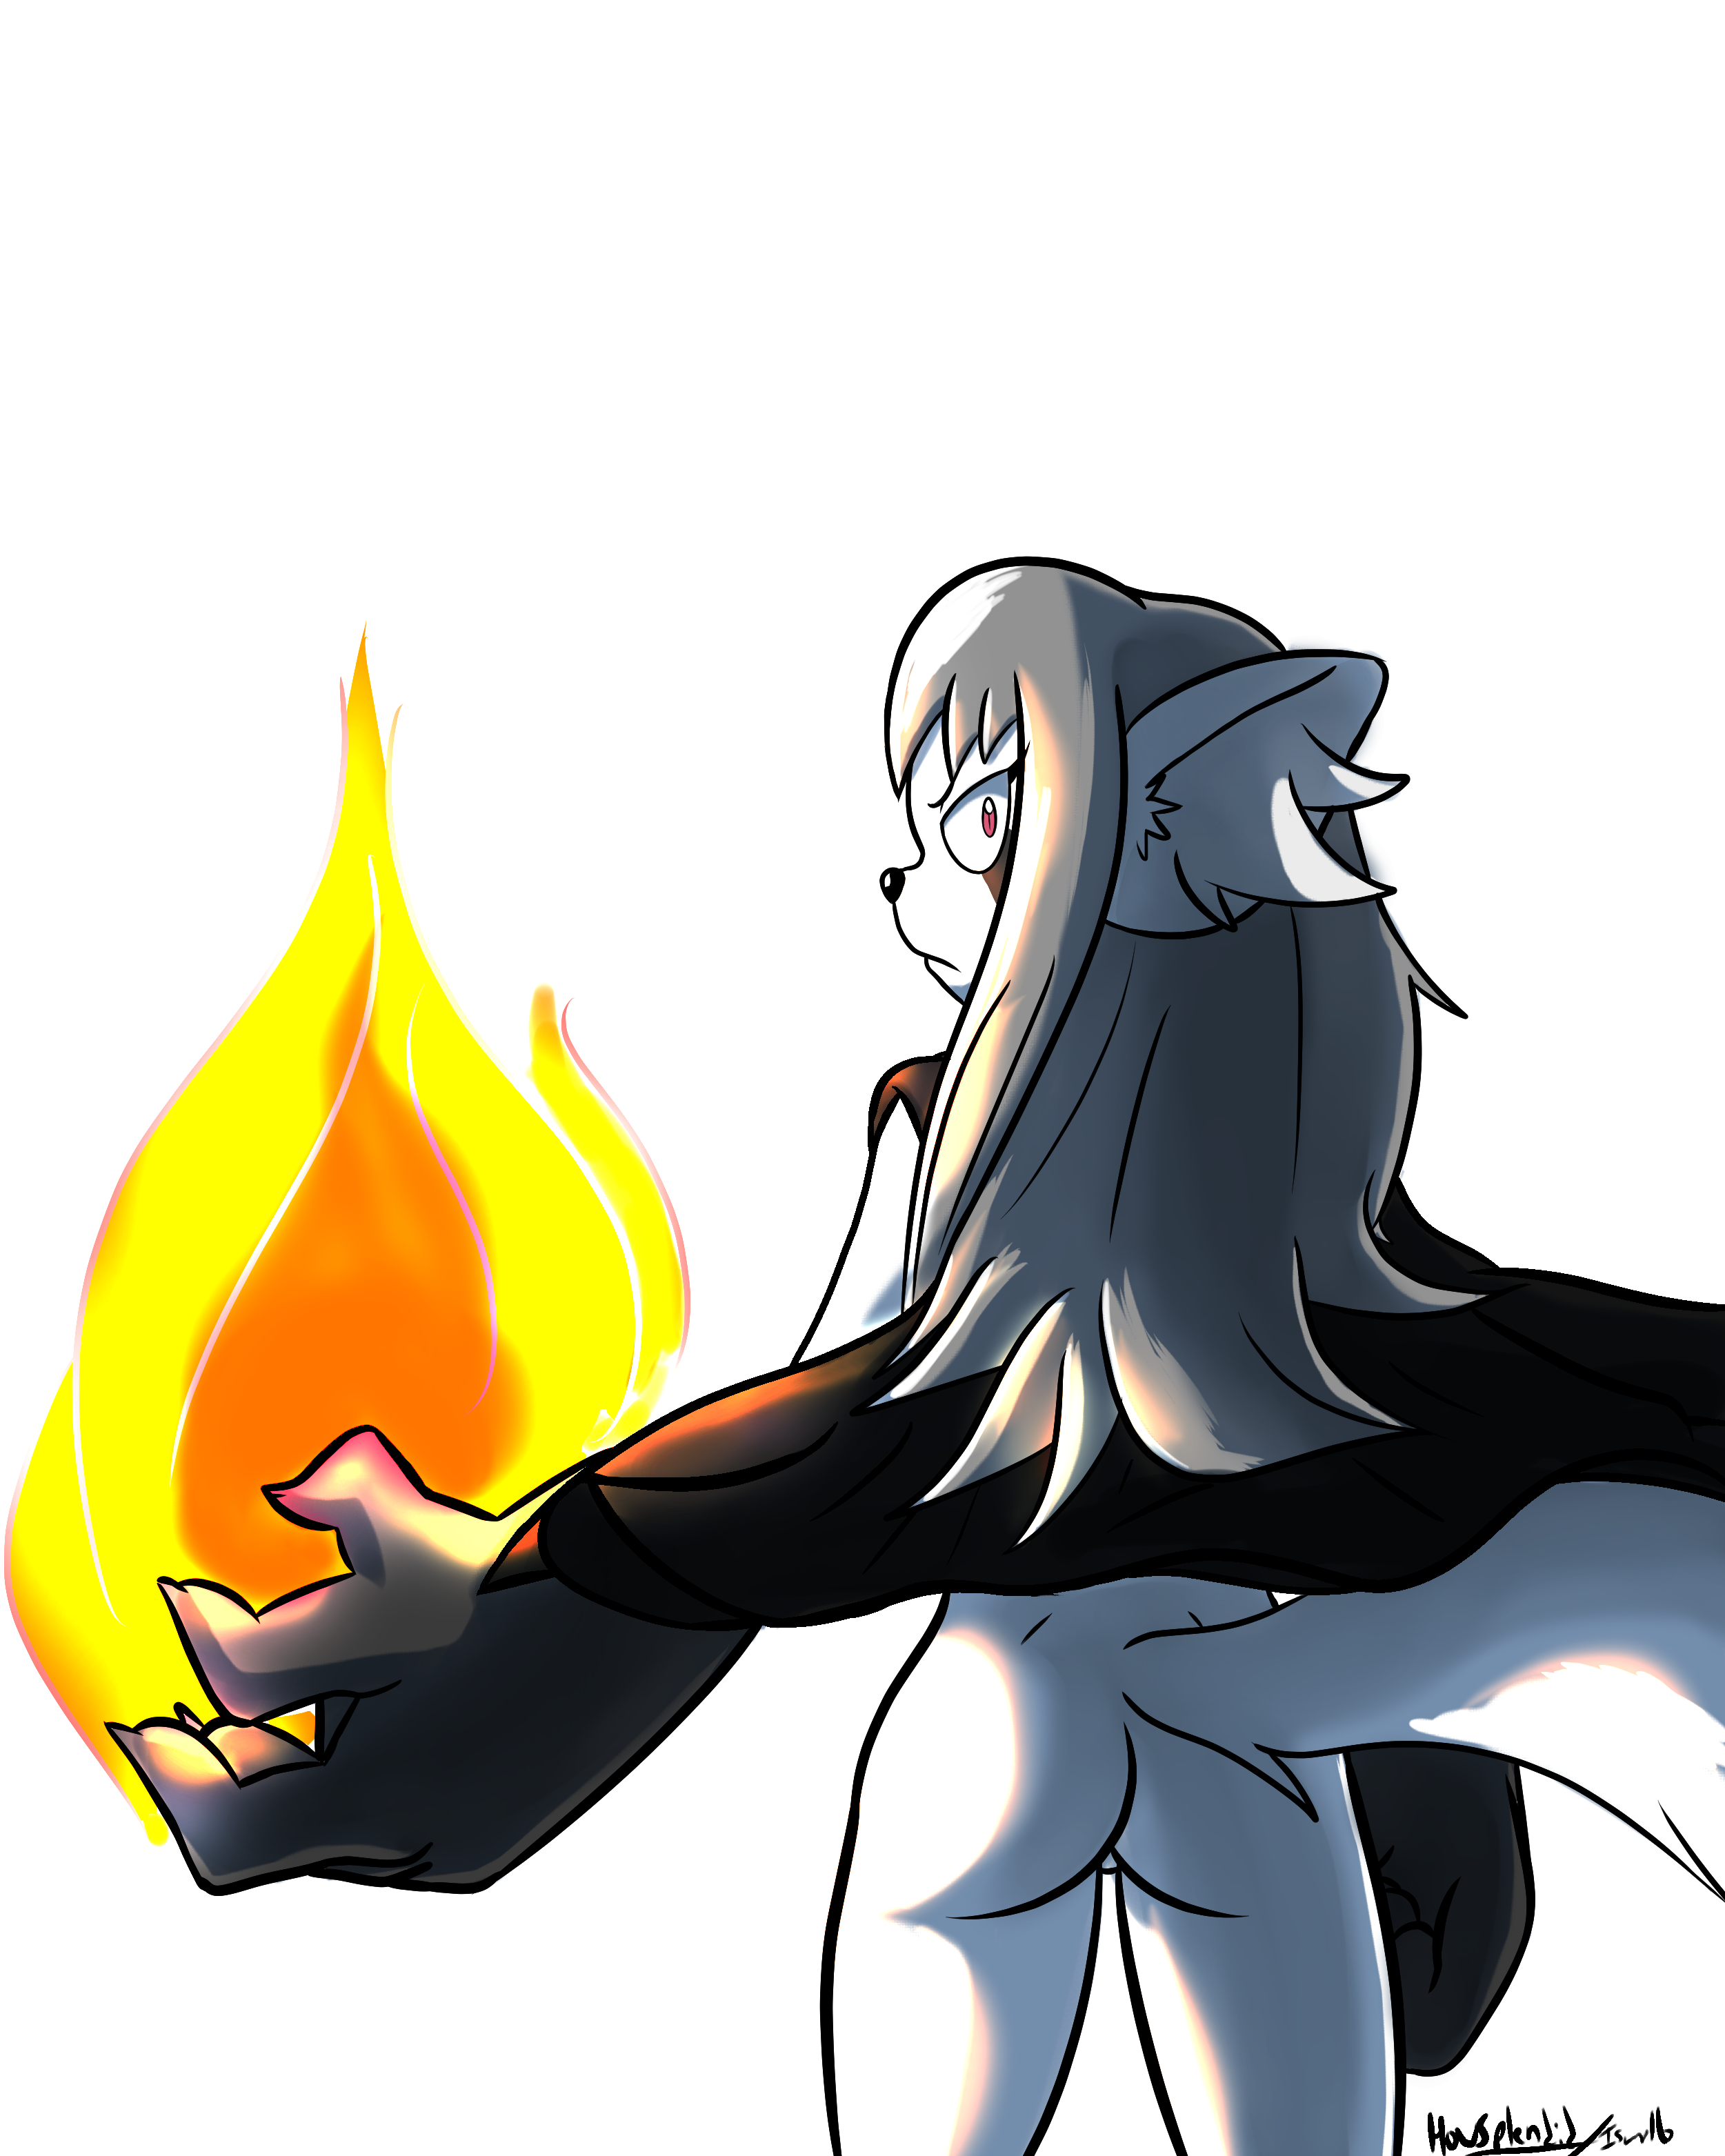 A pretty big fire